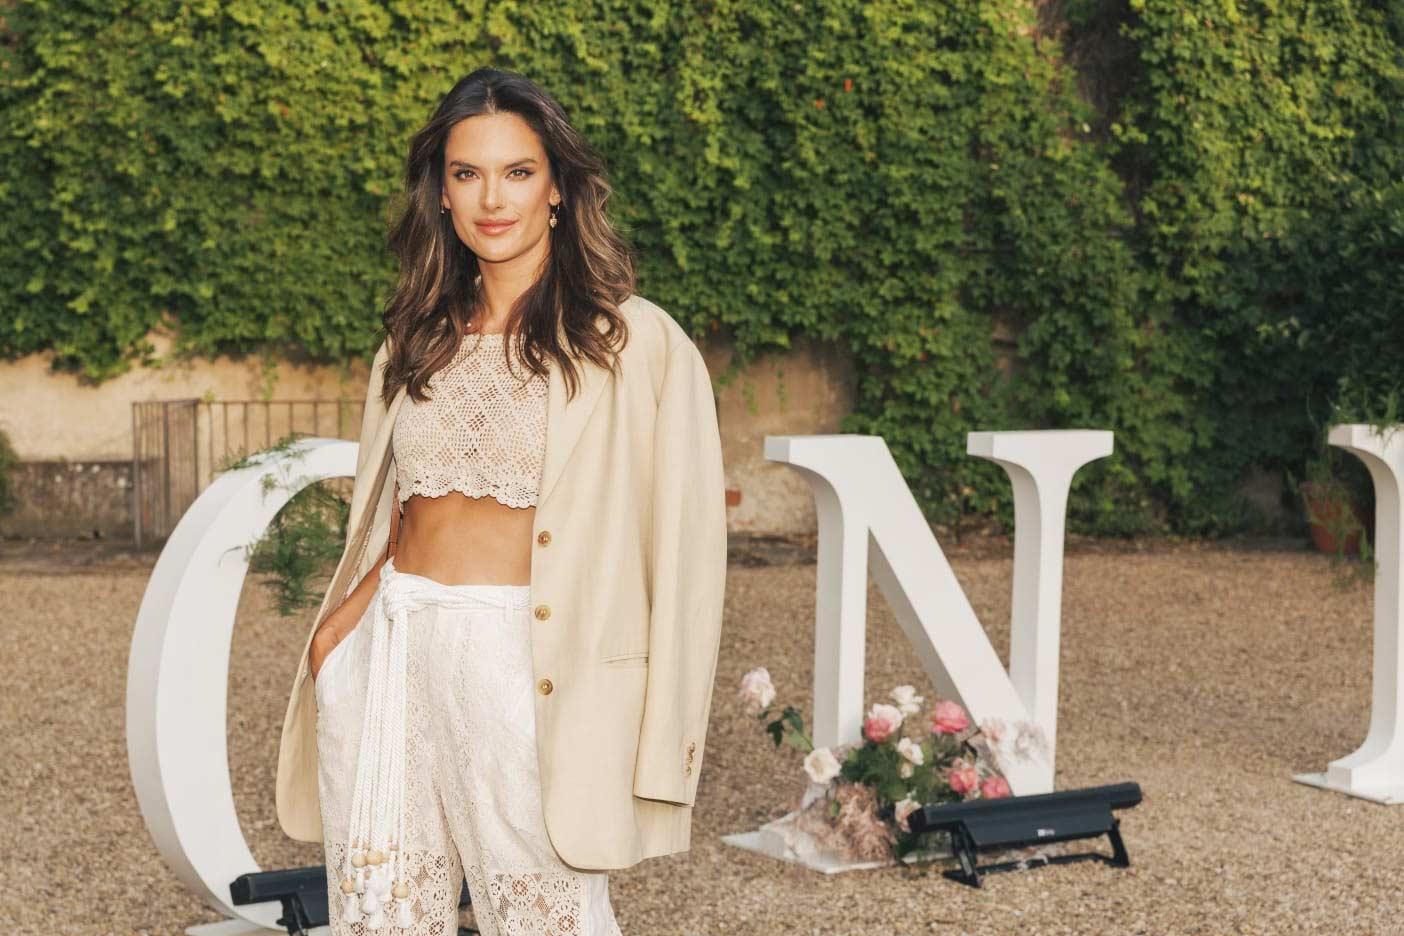 Monnalisa Spring-Summer Fashion Show - Firenze 2019 - Alessandra Ambrosio - Hair Massimo Serini